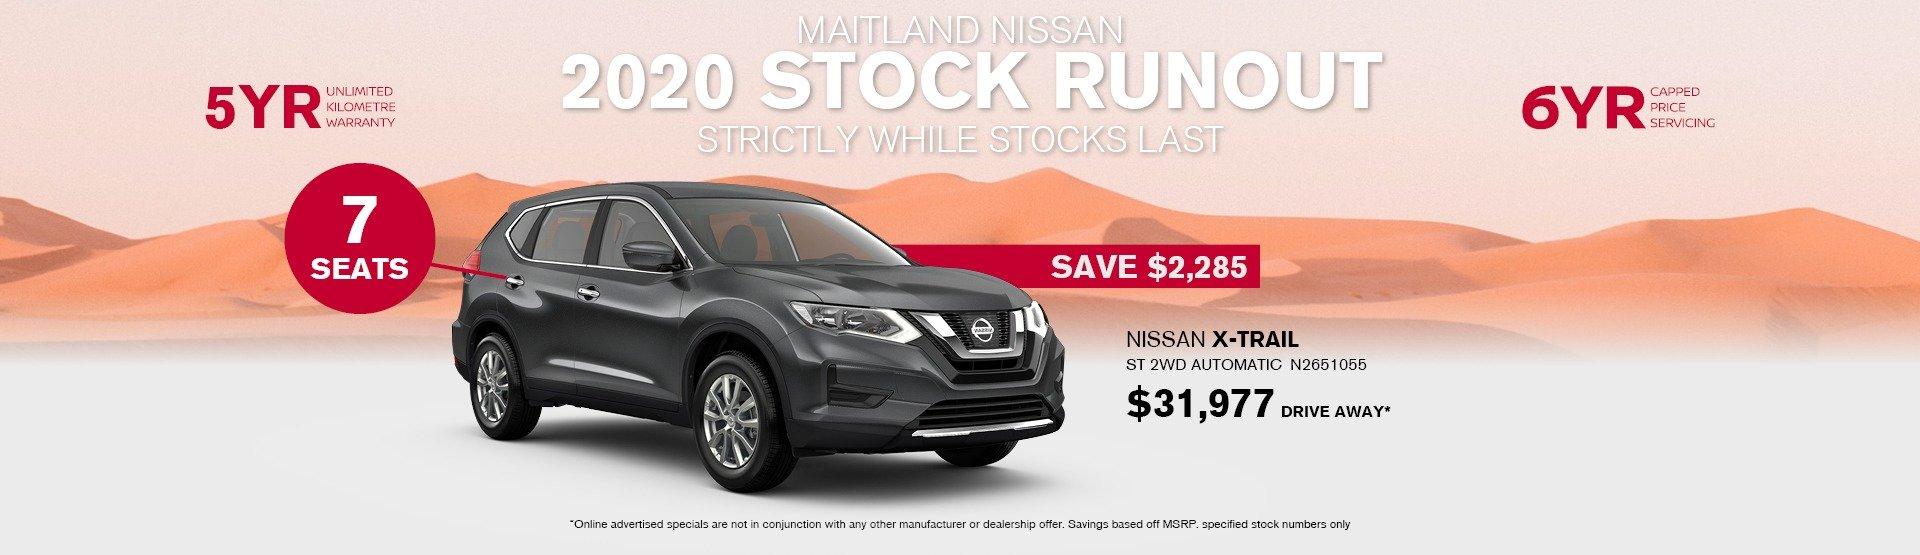 2020 Nissan X-trail special